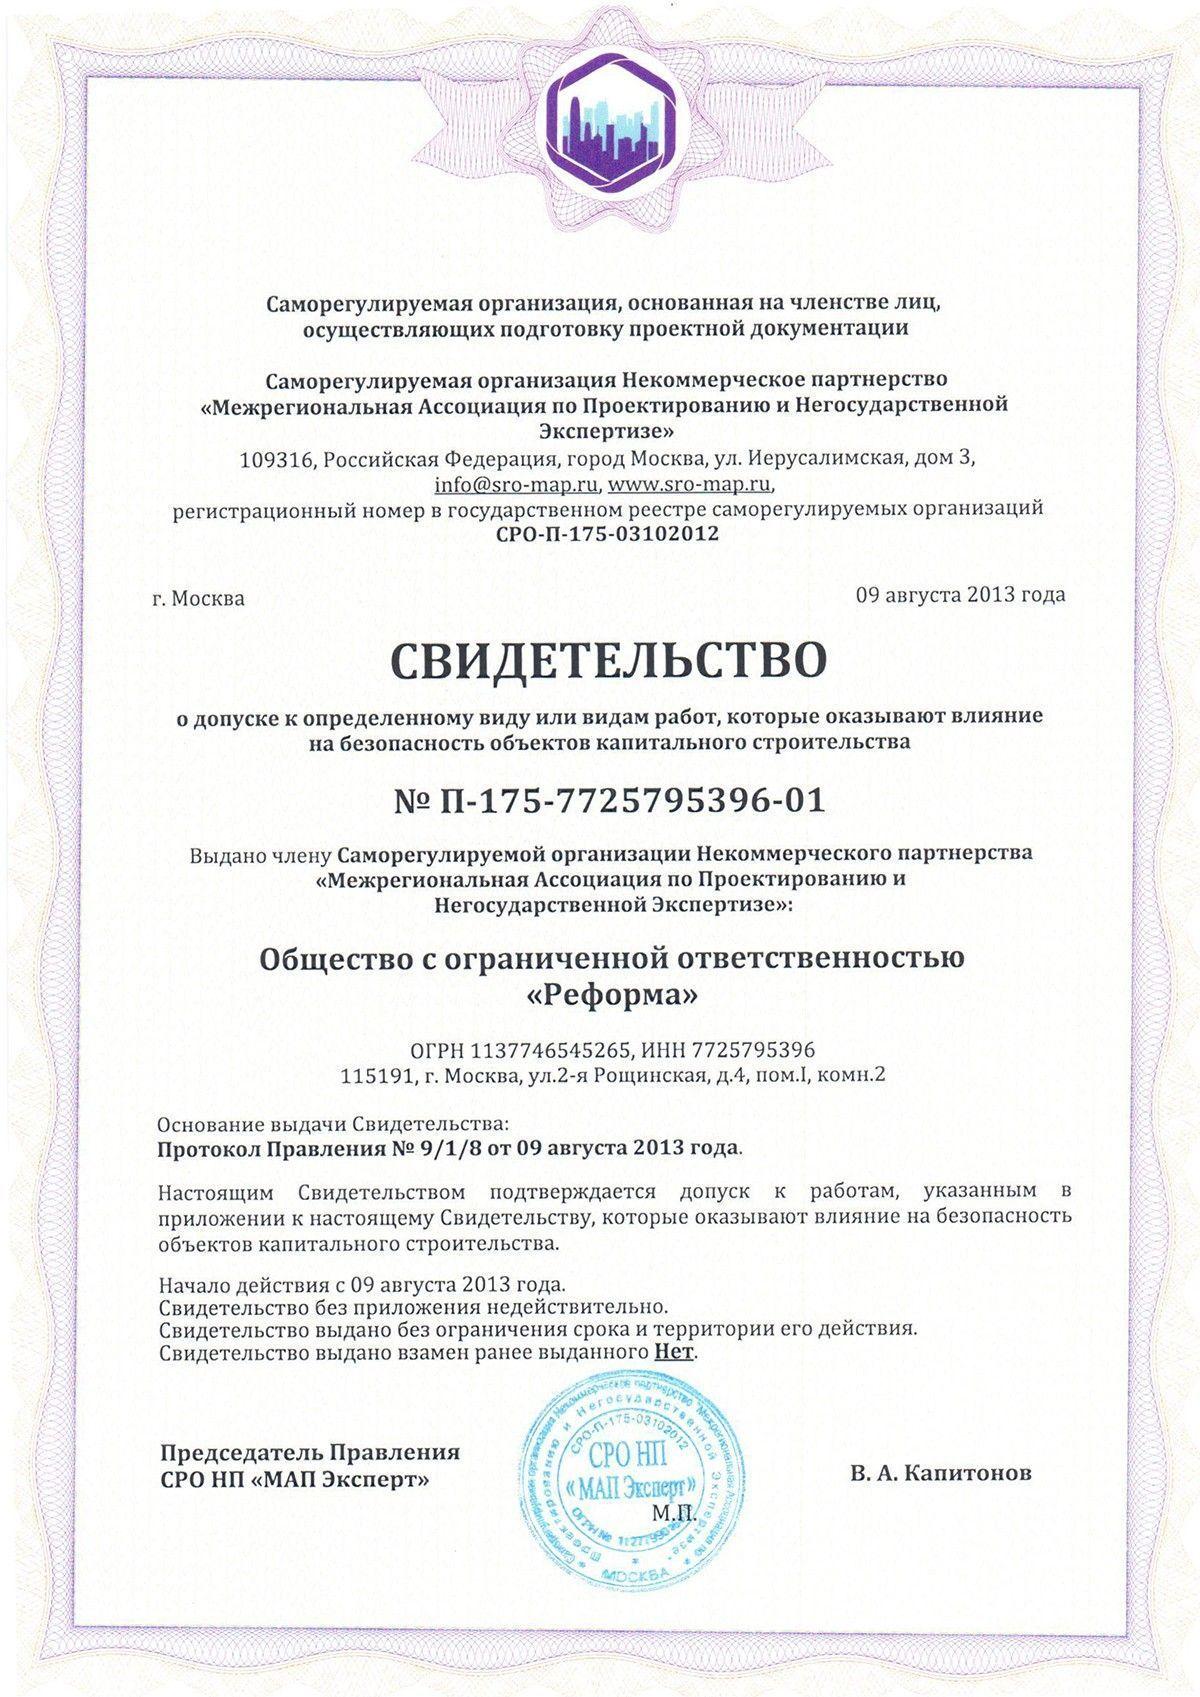 <a href='https://archreforma.ru/publikaciiinagrady/svidetelstvo-po-vidam-rabot/'>Посмотреть подробнее... 'Свидетельство по видам работ</a>